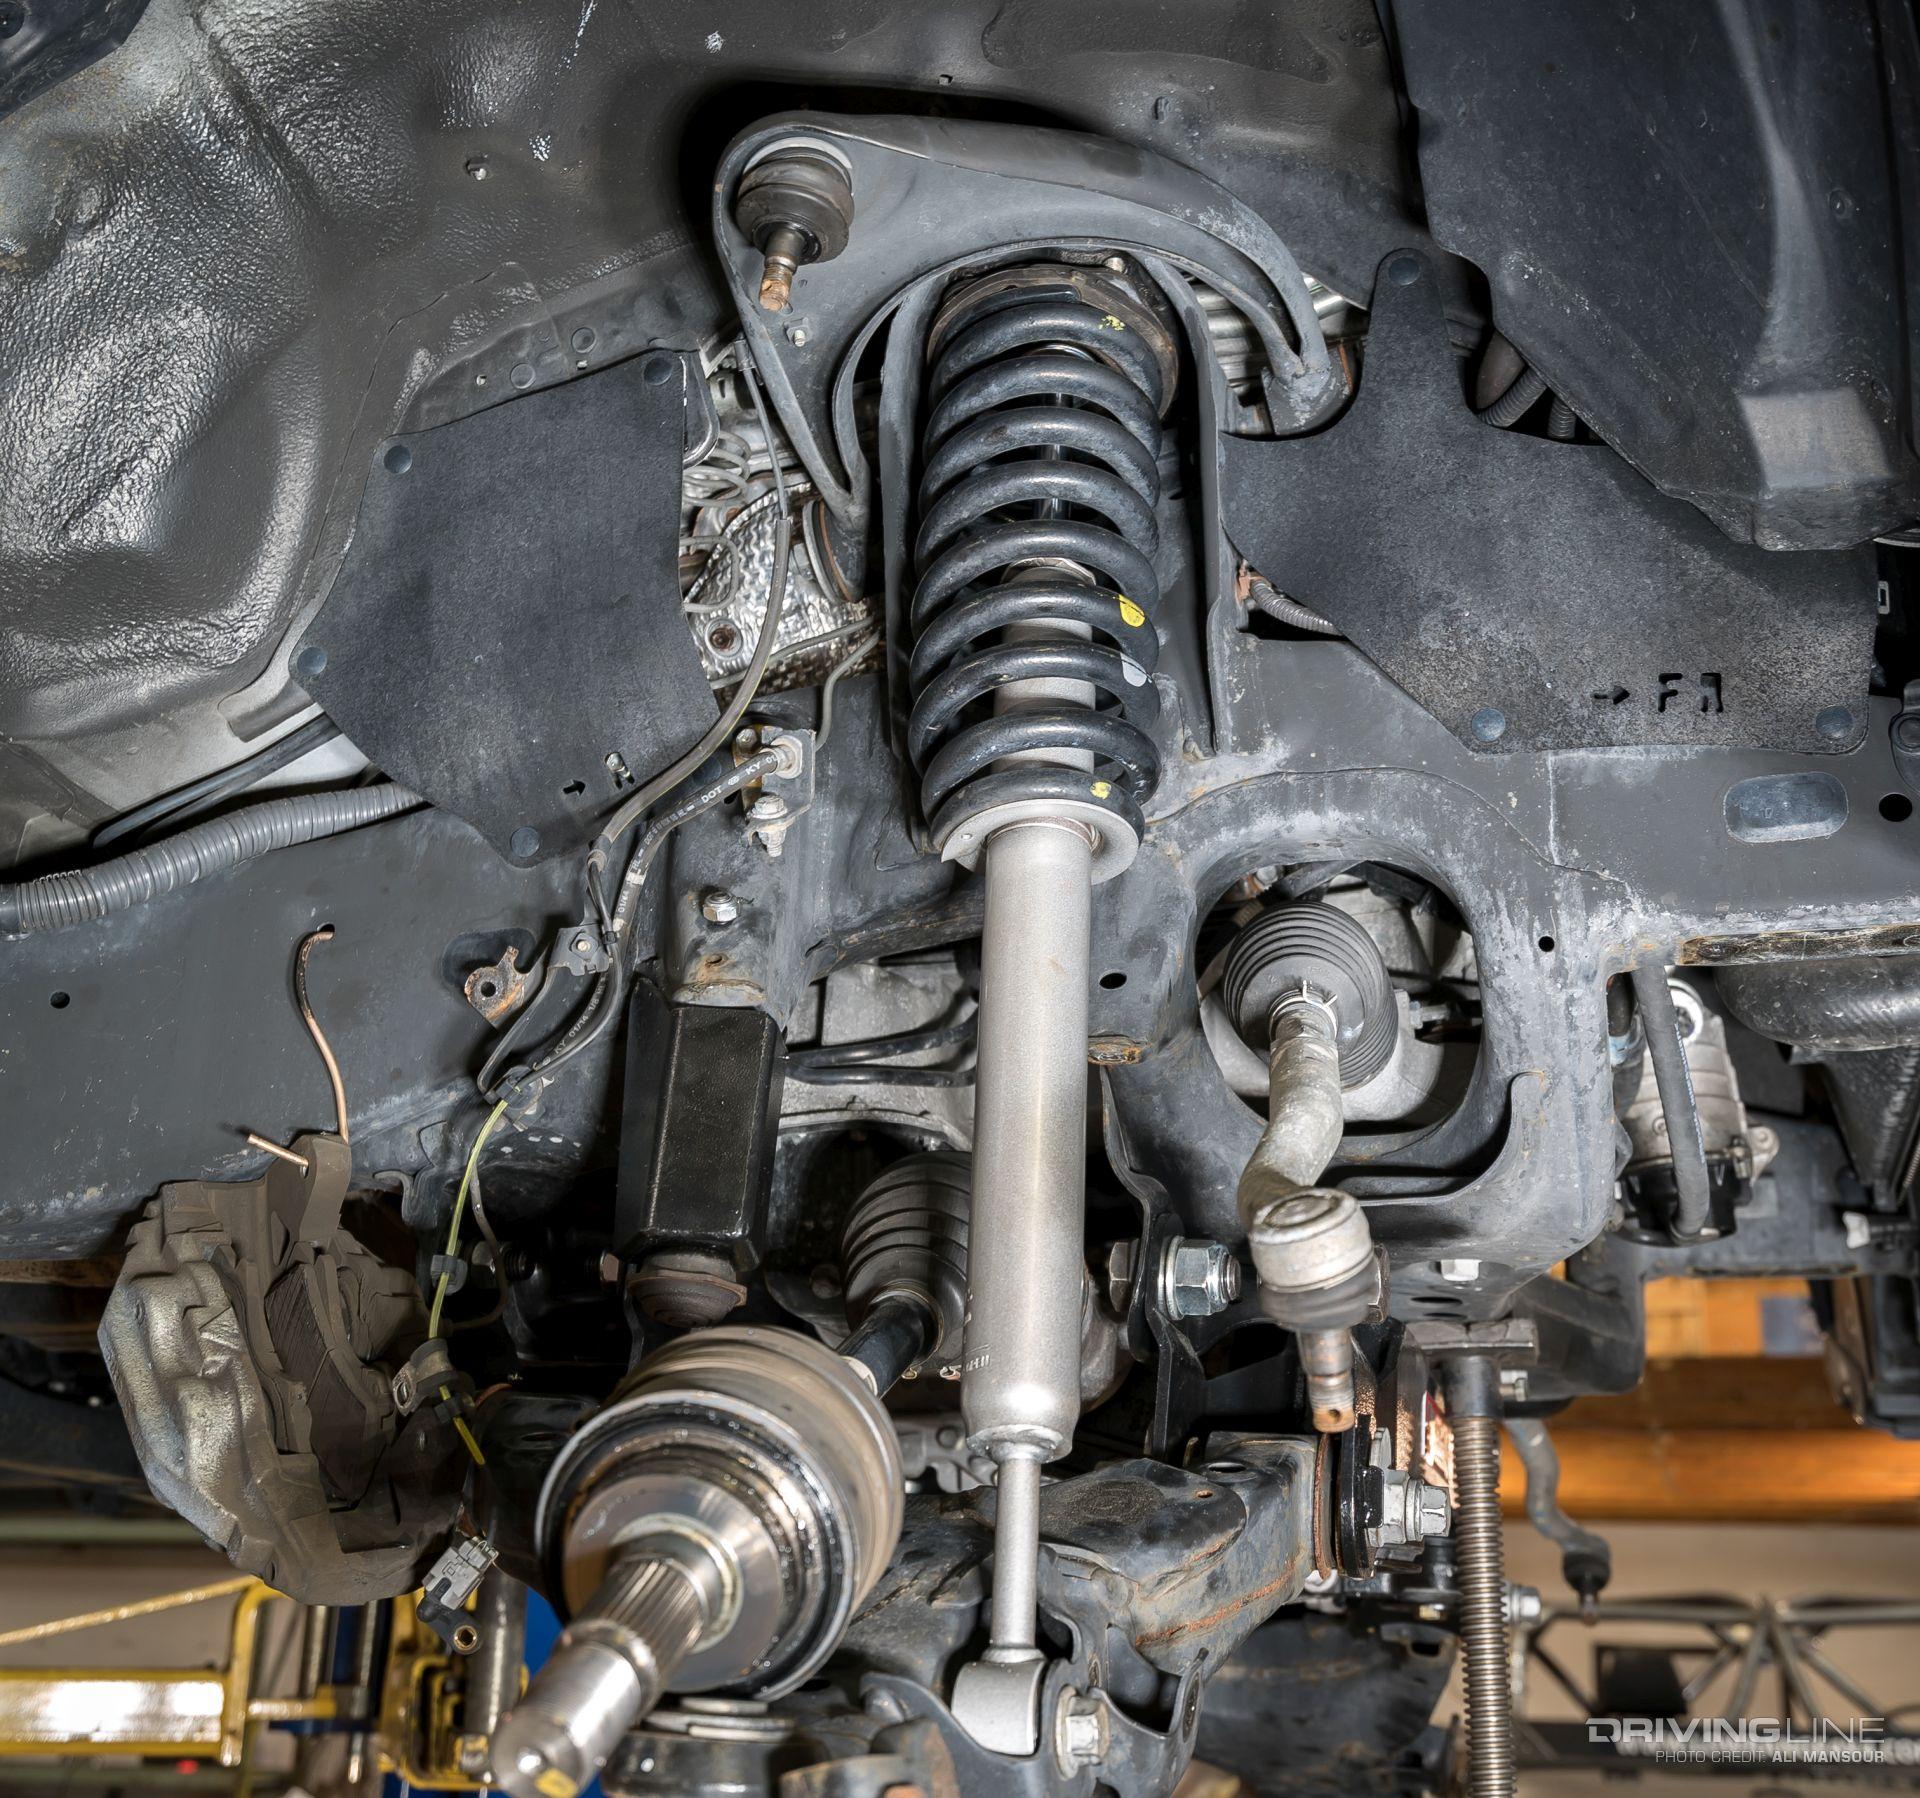 2017 Tundra Diesel >> 2014 Toyota Tundra Skyjacker 6-inch Lift Review | DrivingLine